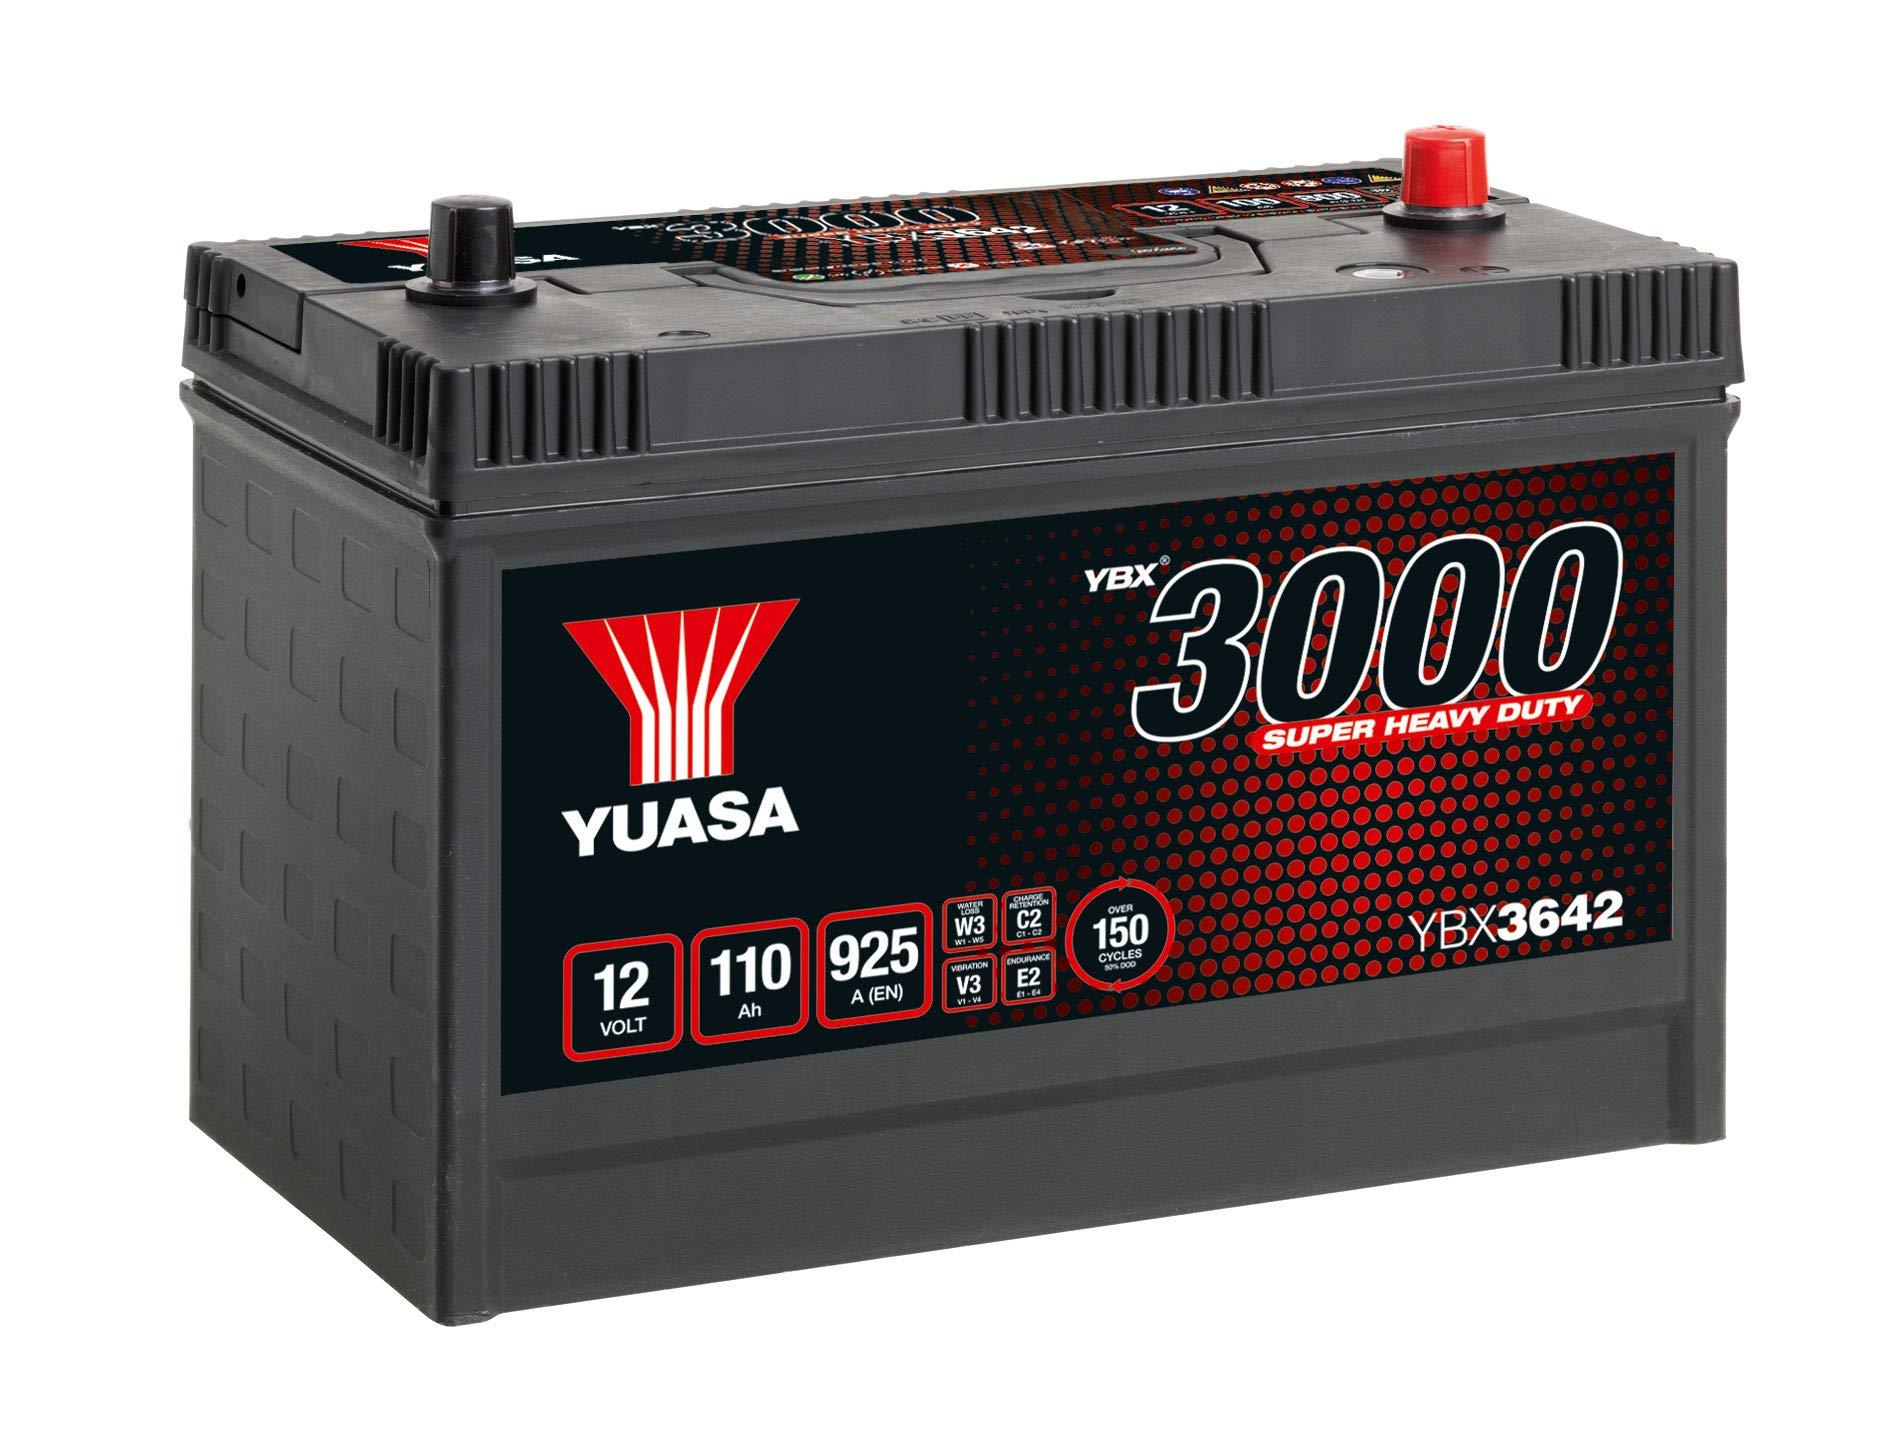 Yuasa YBX3642-110 12V 110Ah 925A Super Heavy Duty SMF Commercial Vehicle Battery